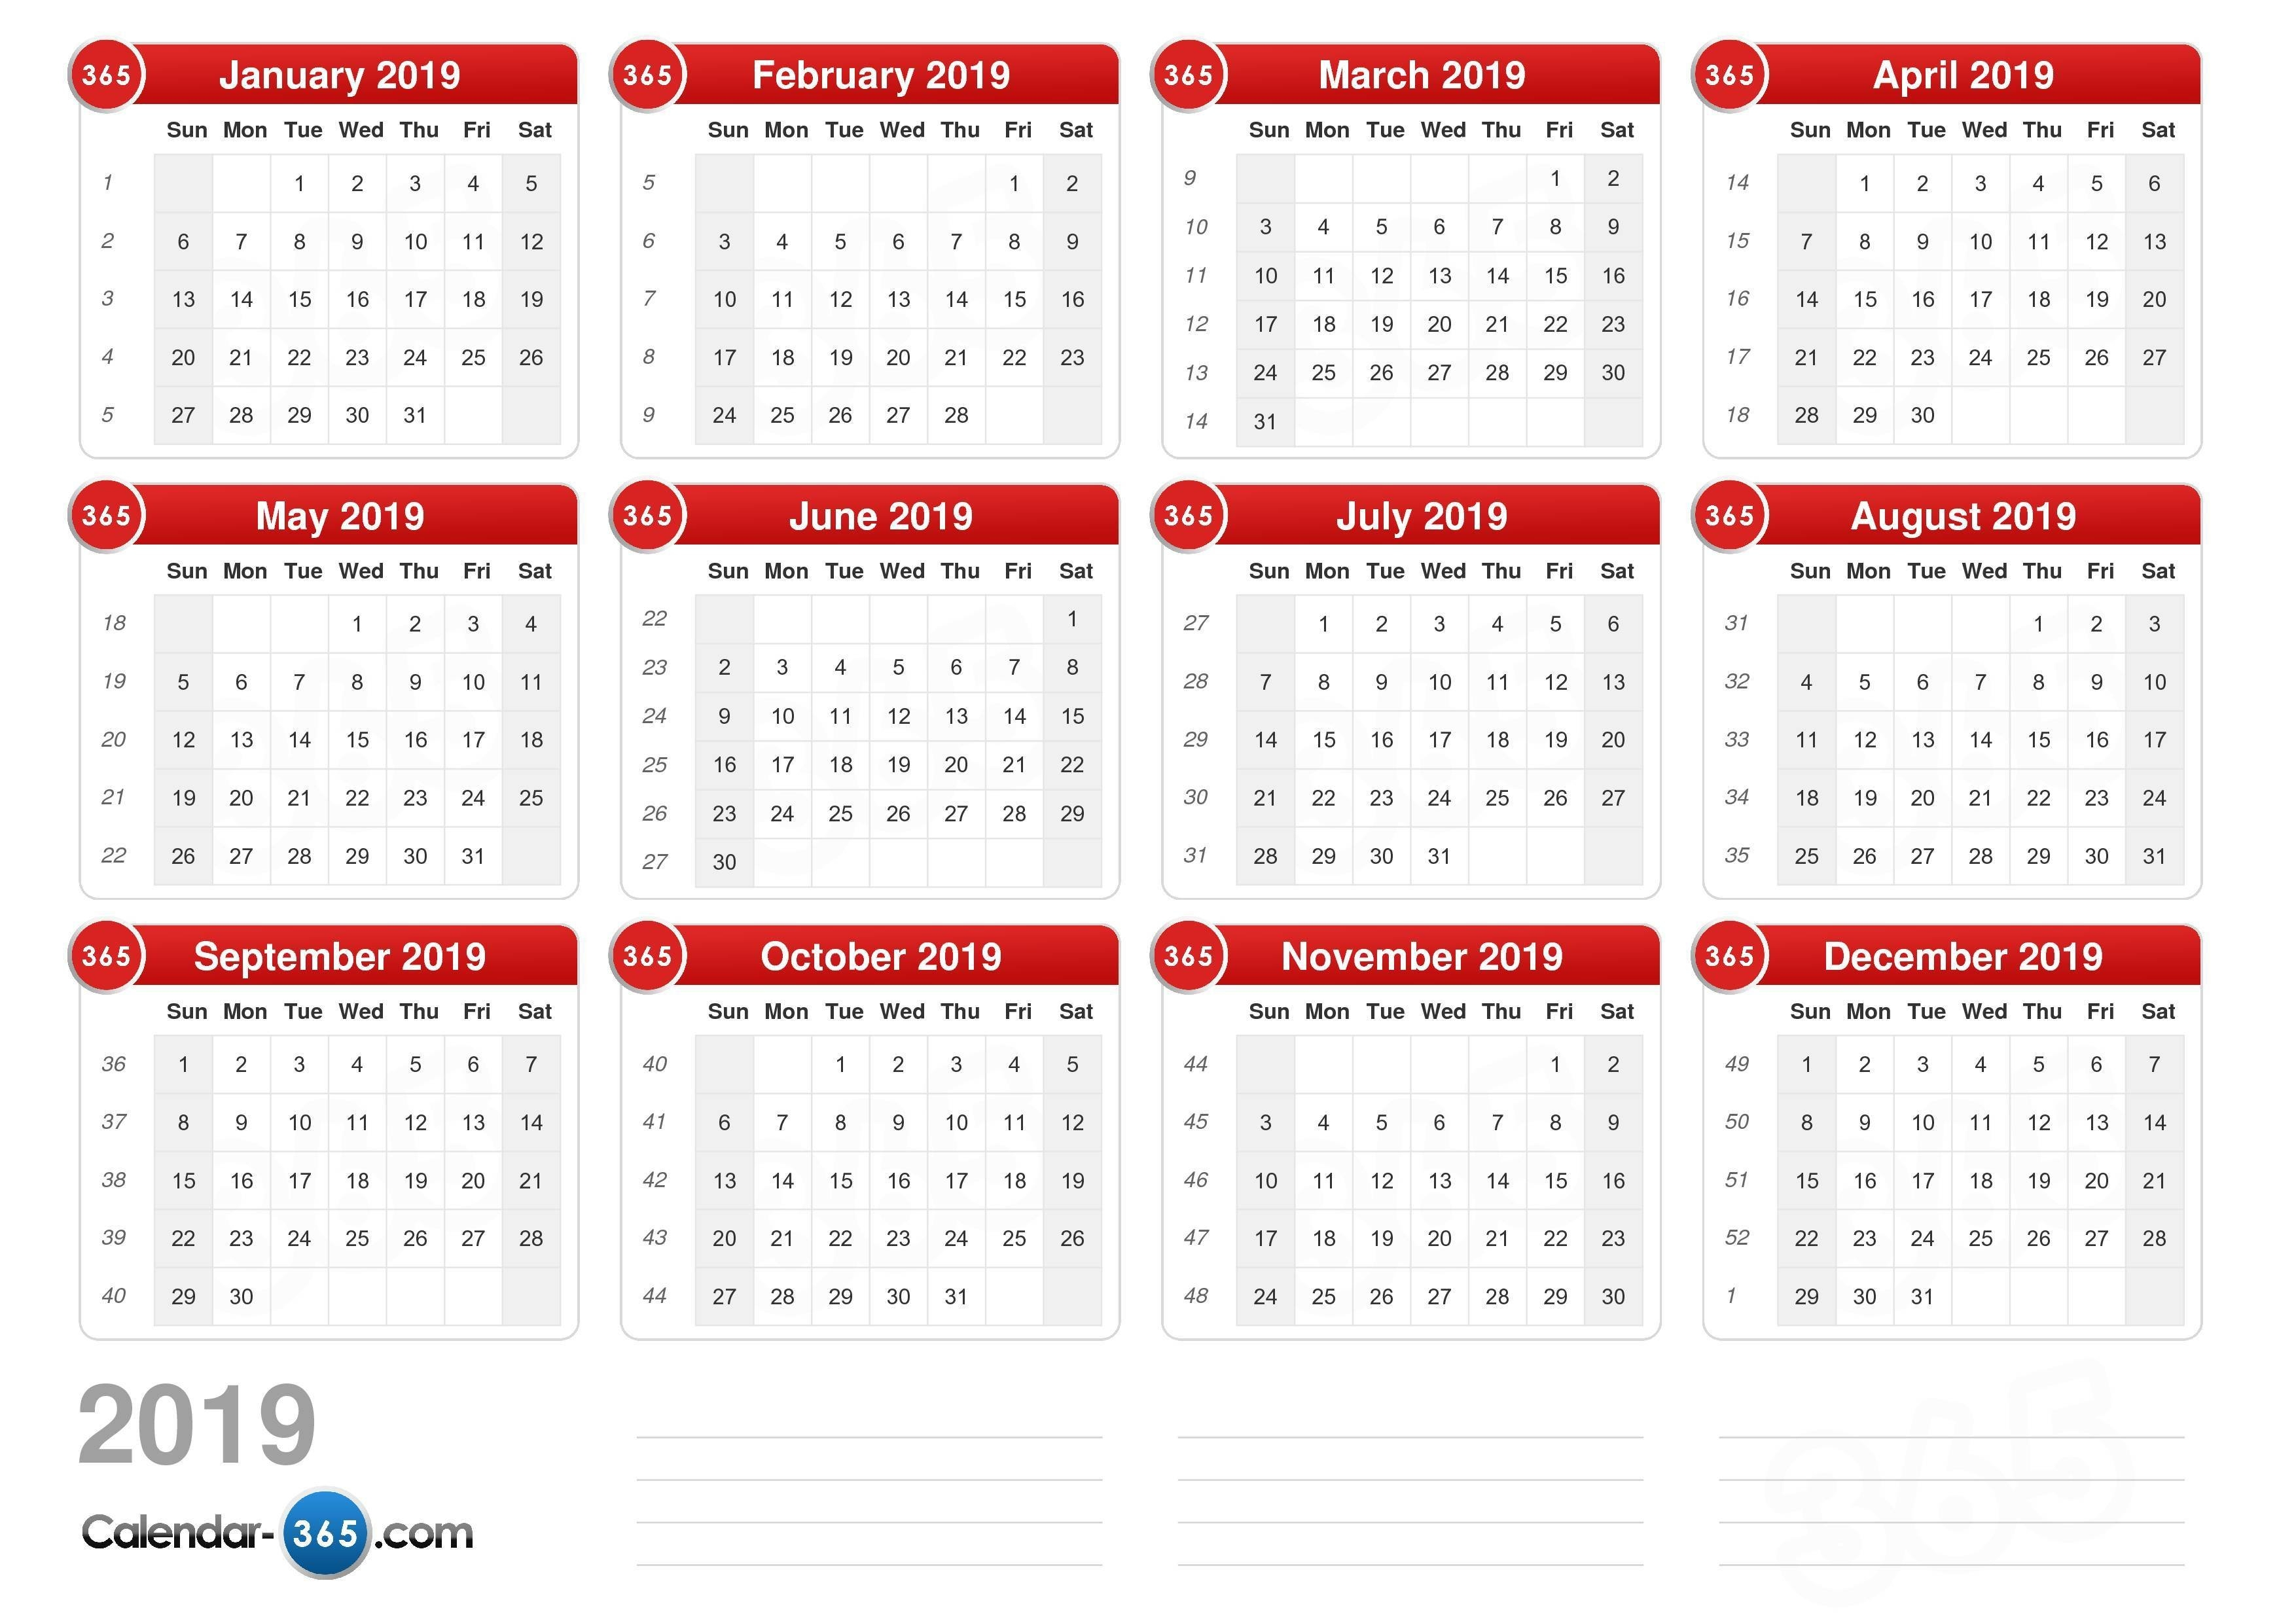 2019 Calendar Calendar 2019 Usa